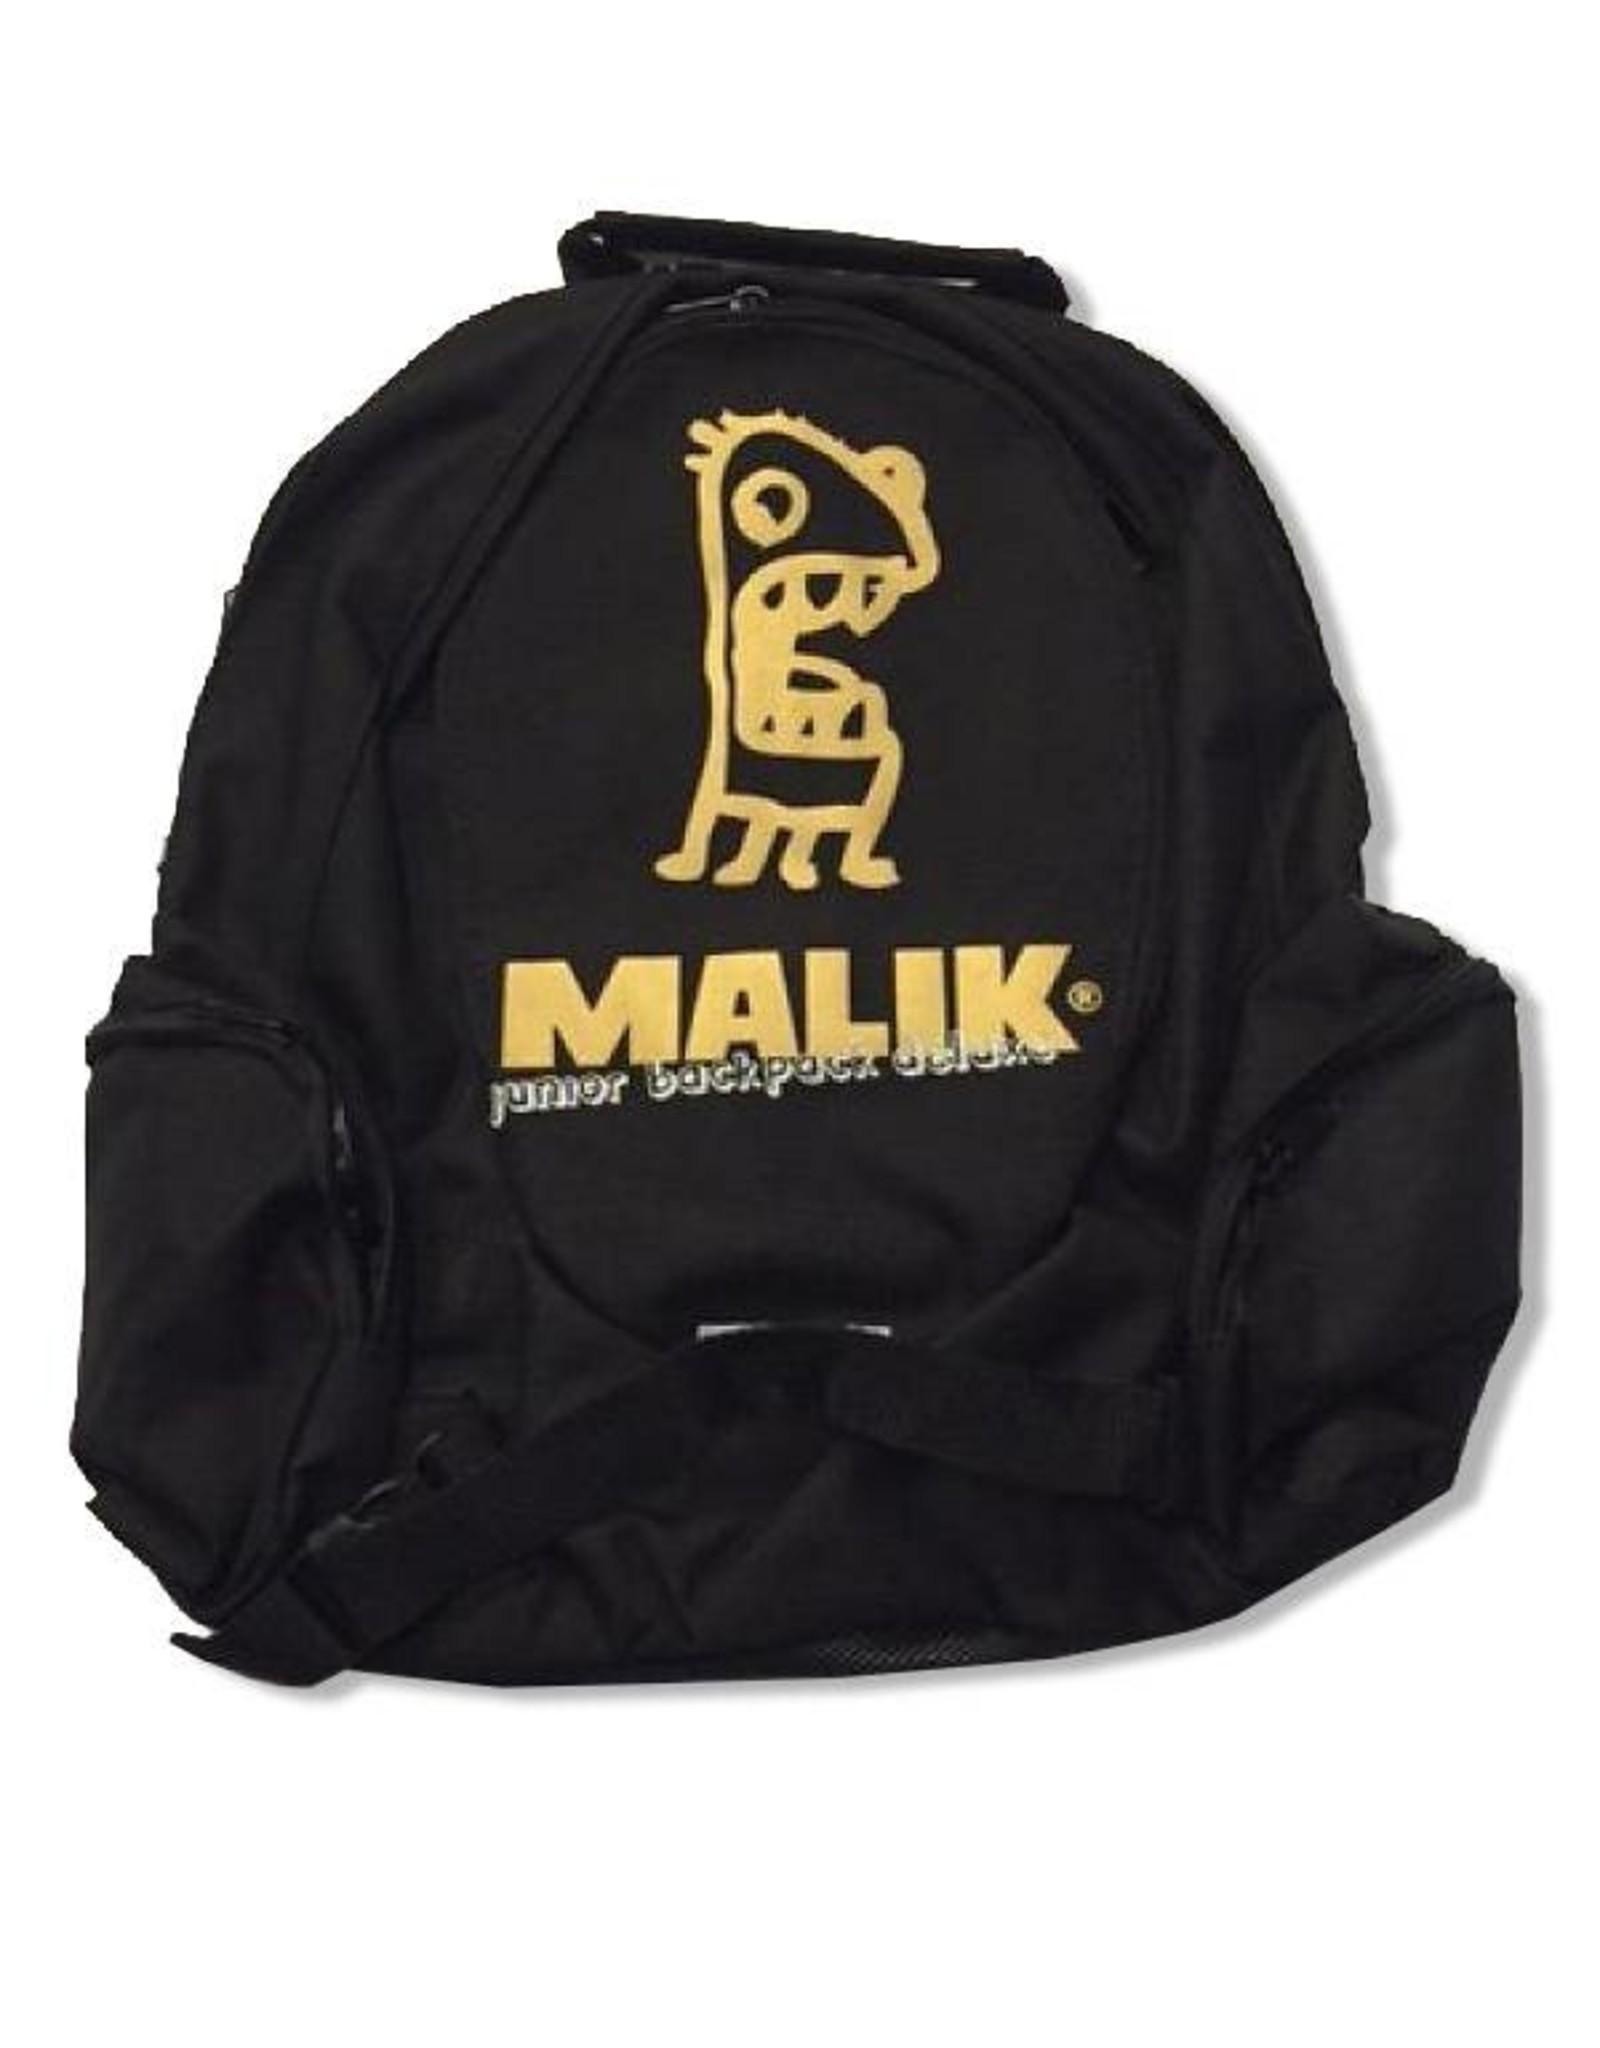 Malik Backpack Junior 14 STUNT PRIJS *